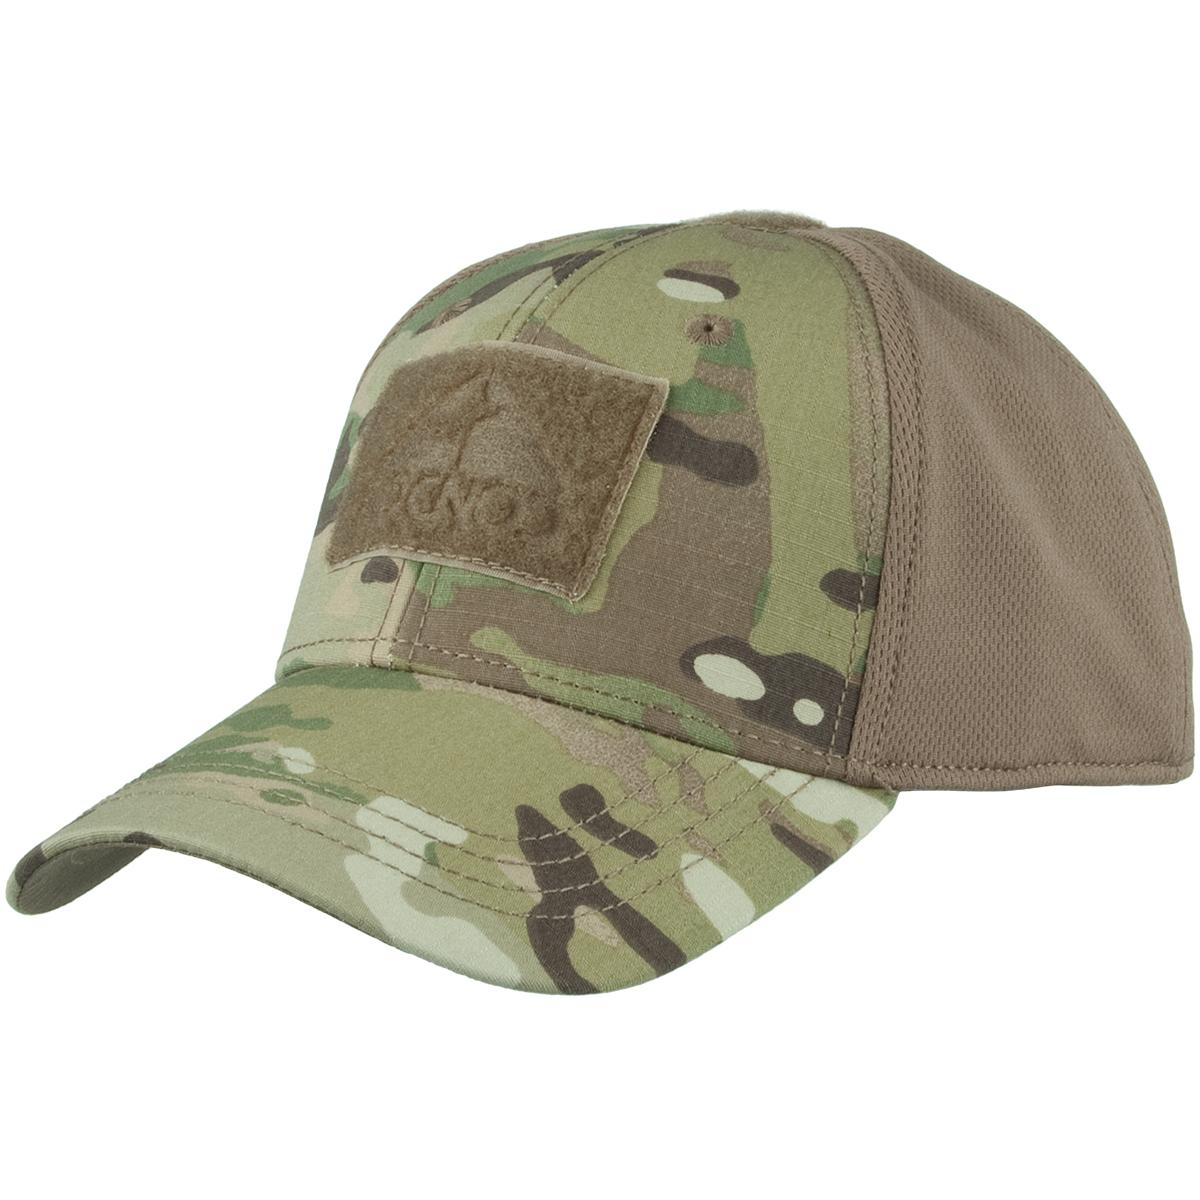 2636eae8212e3 Sentinel Thumbnail 1. Sentinel CONDOR FLEX BASEBALL ARMY CAP MILITARY  PATROL POLYCOTTON MENS HAT MULTICAM CAMO